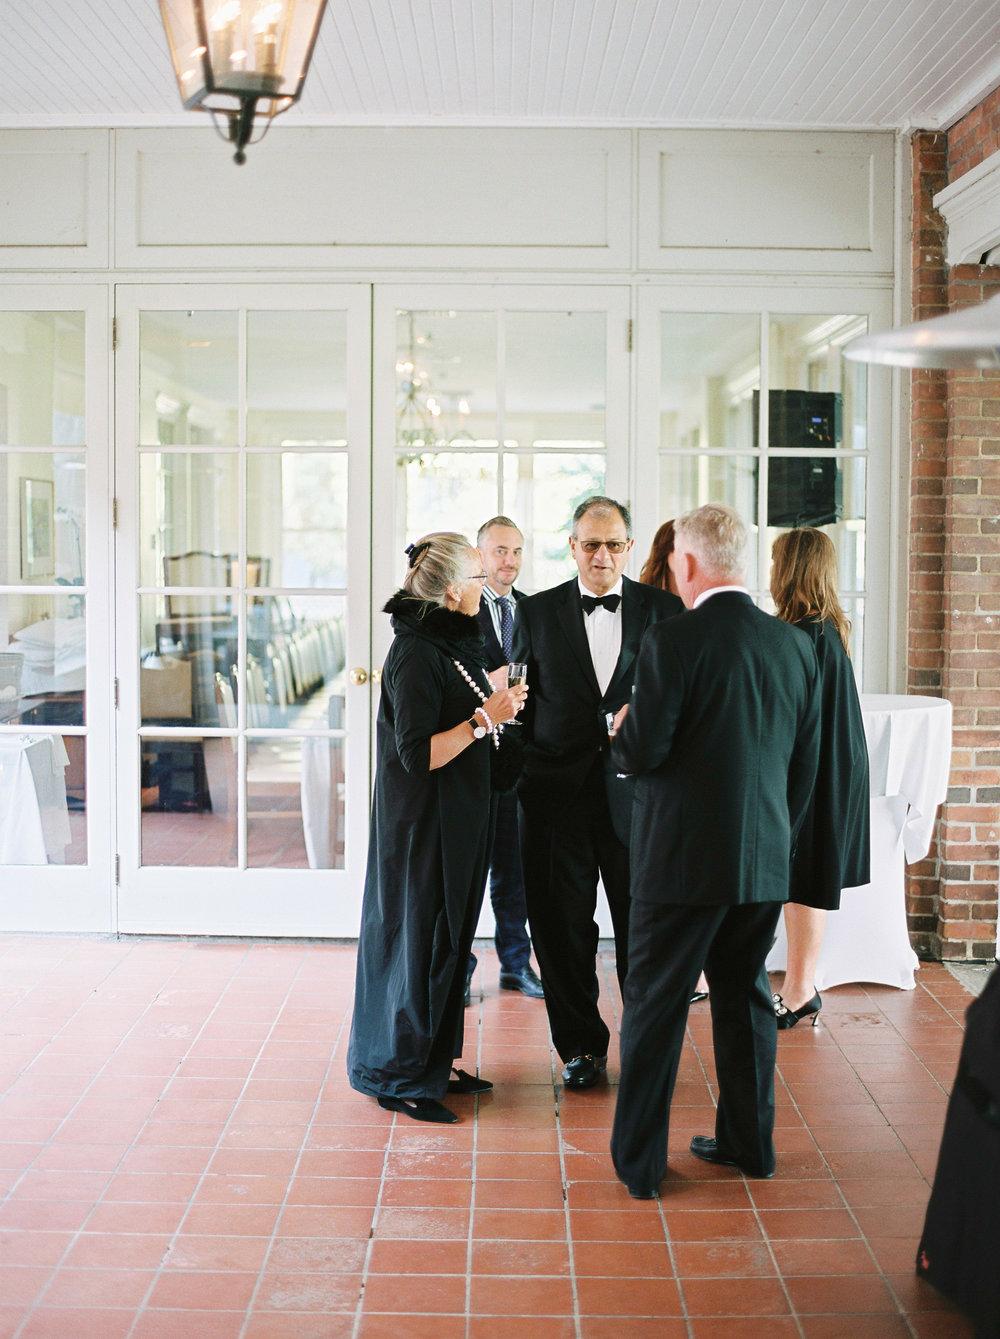 0371-Geneva-Ian-Wedding-Toronto Golf Club-When He Found Her-TorontoPhotographer.jpg